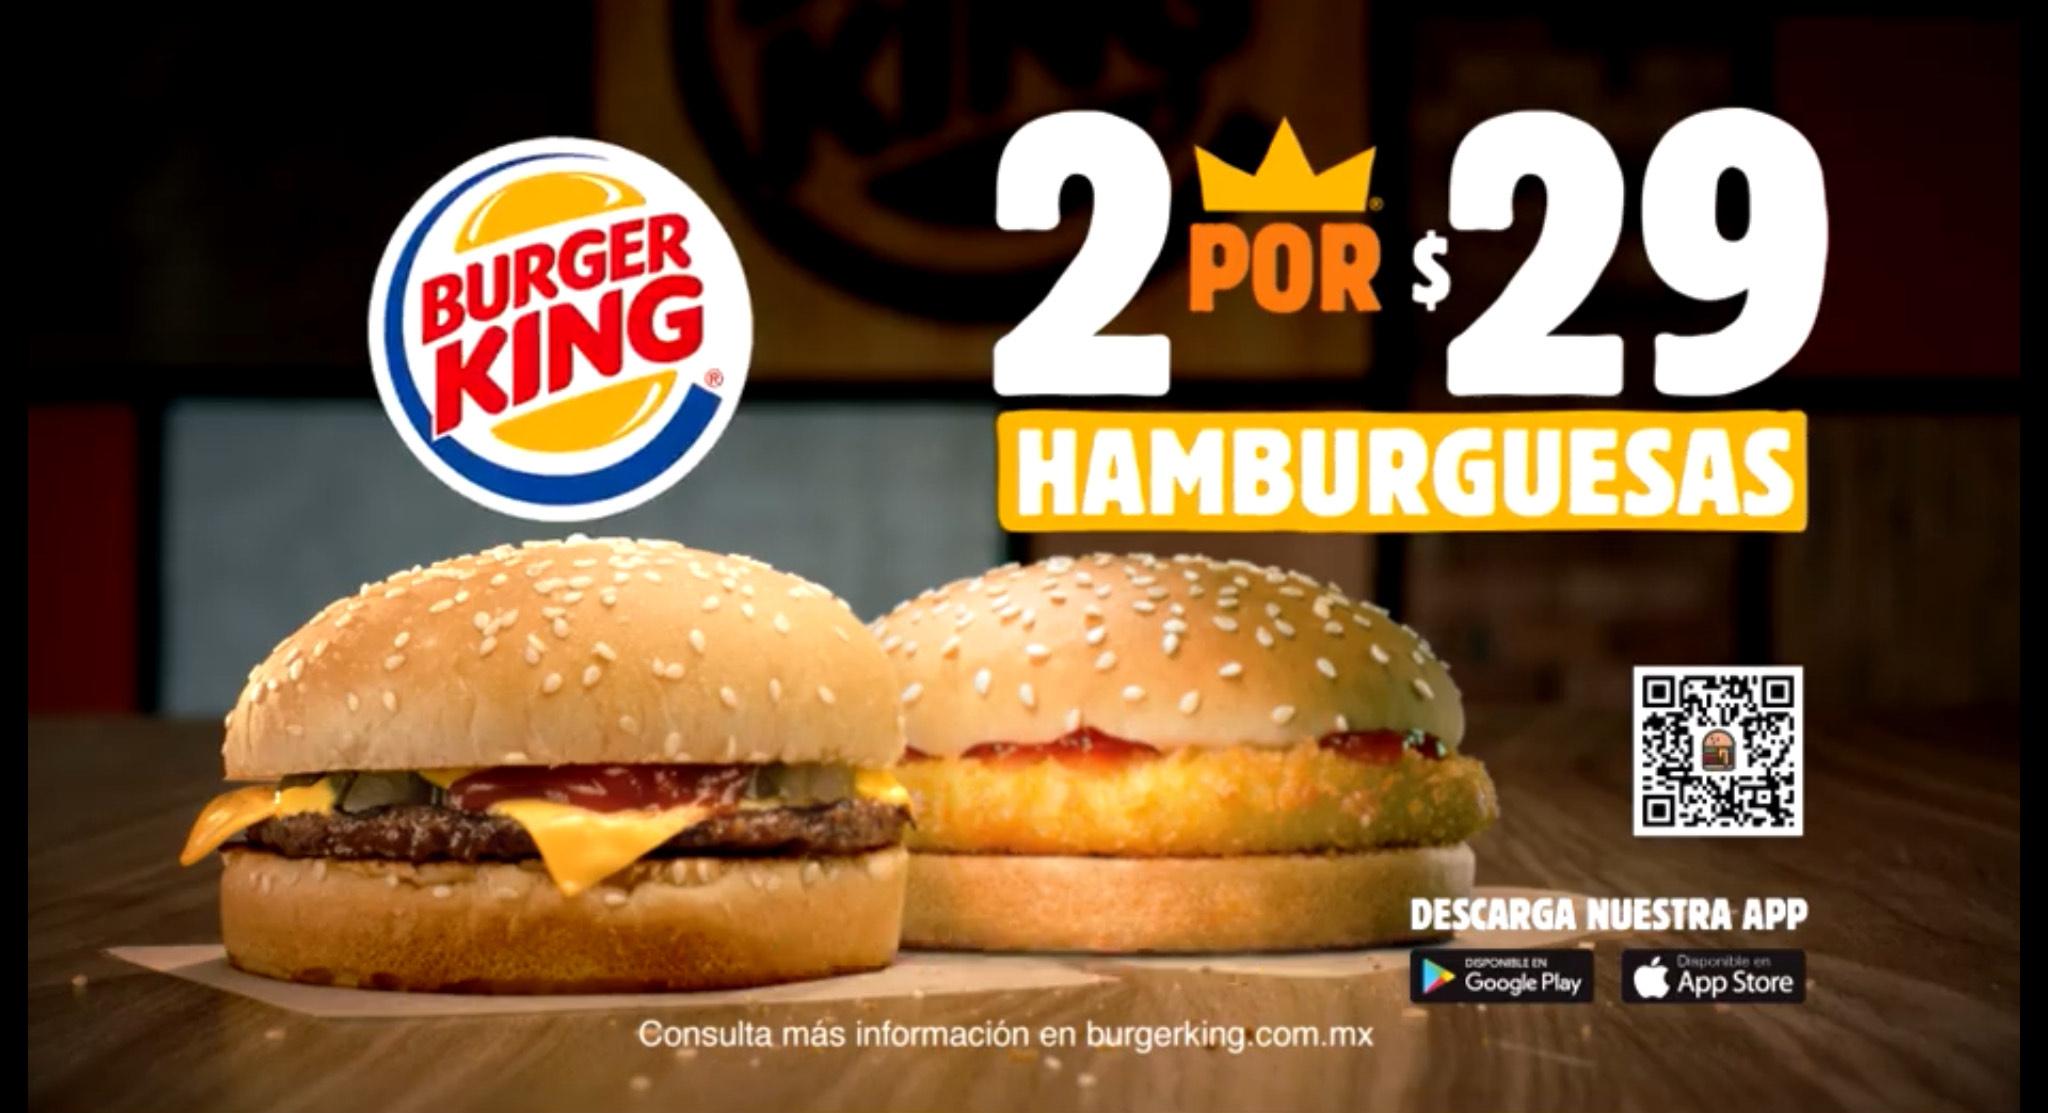 Burger King App: 2x$29 Hamburguesas Carne y/o Pollo